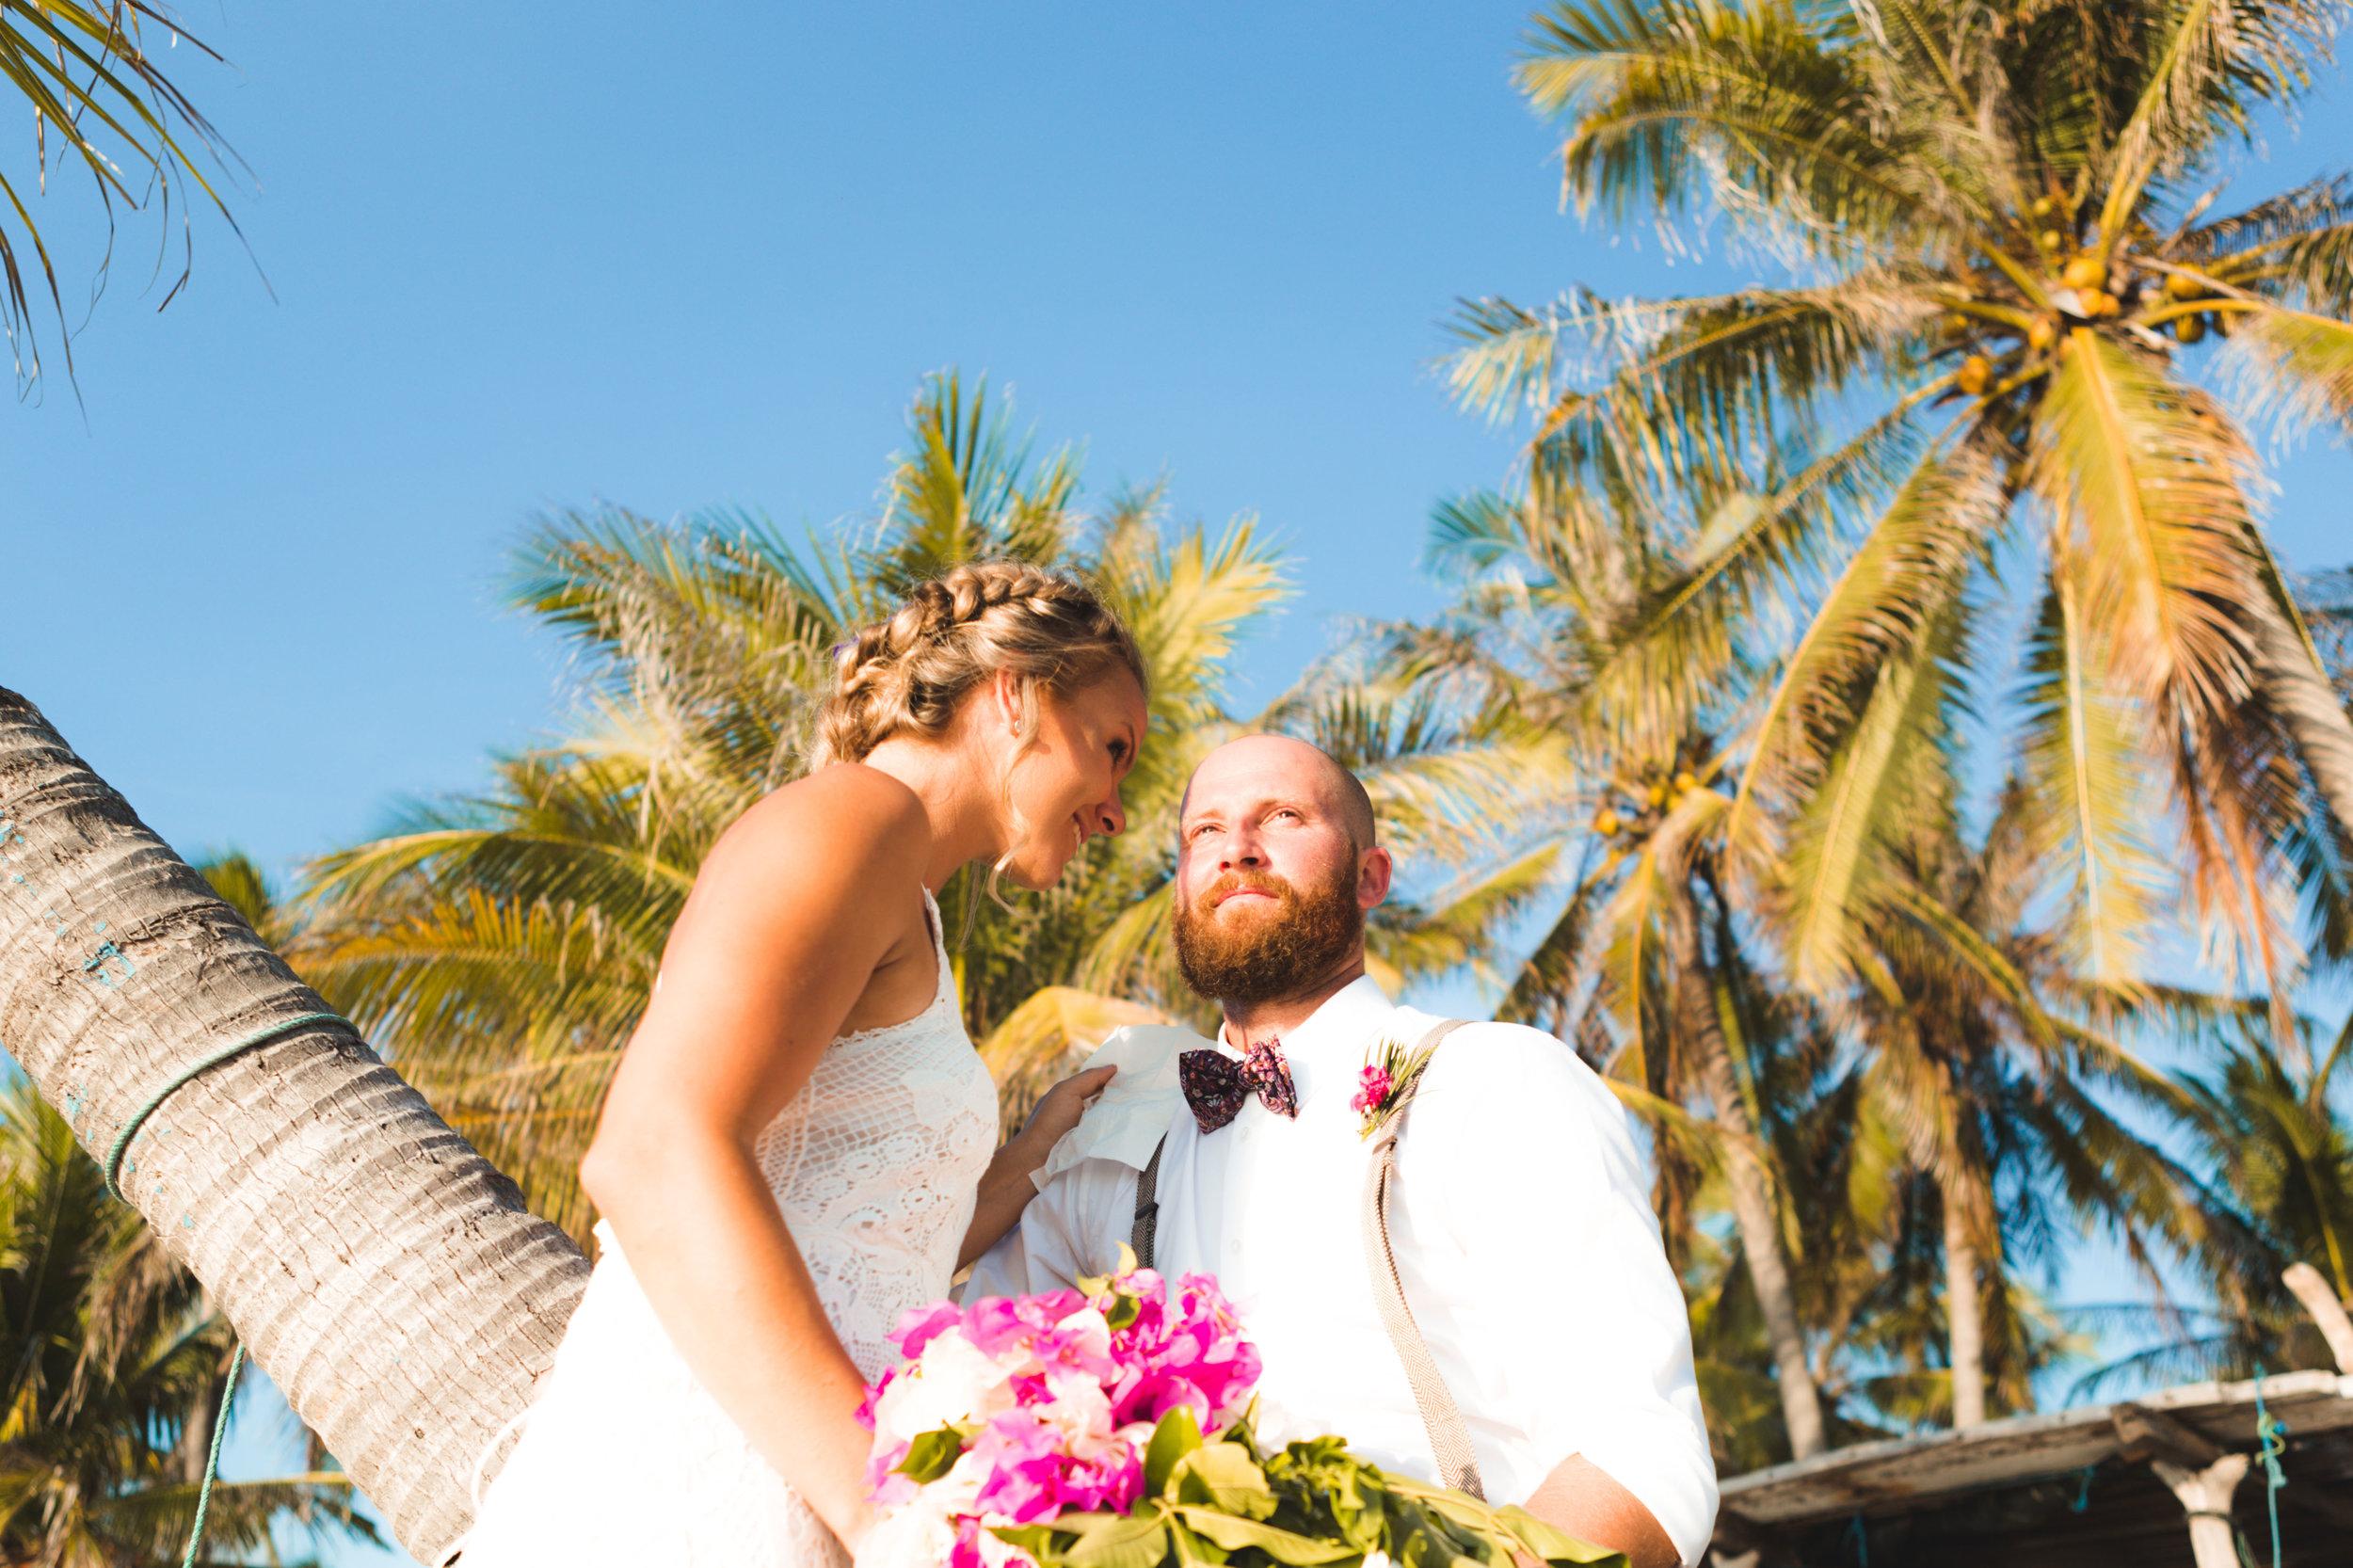 hedi and mitch wedding ig64 (1 of 1).jpg